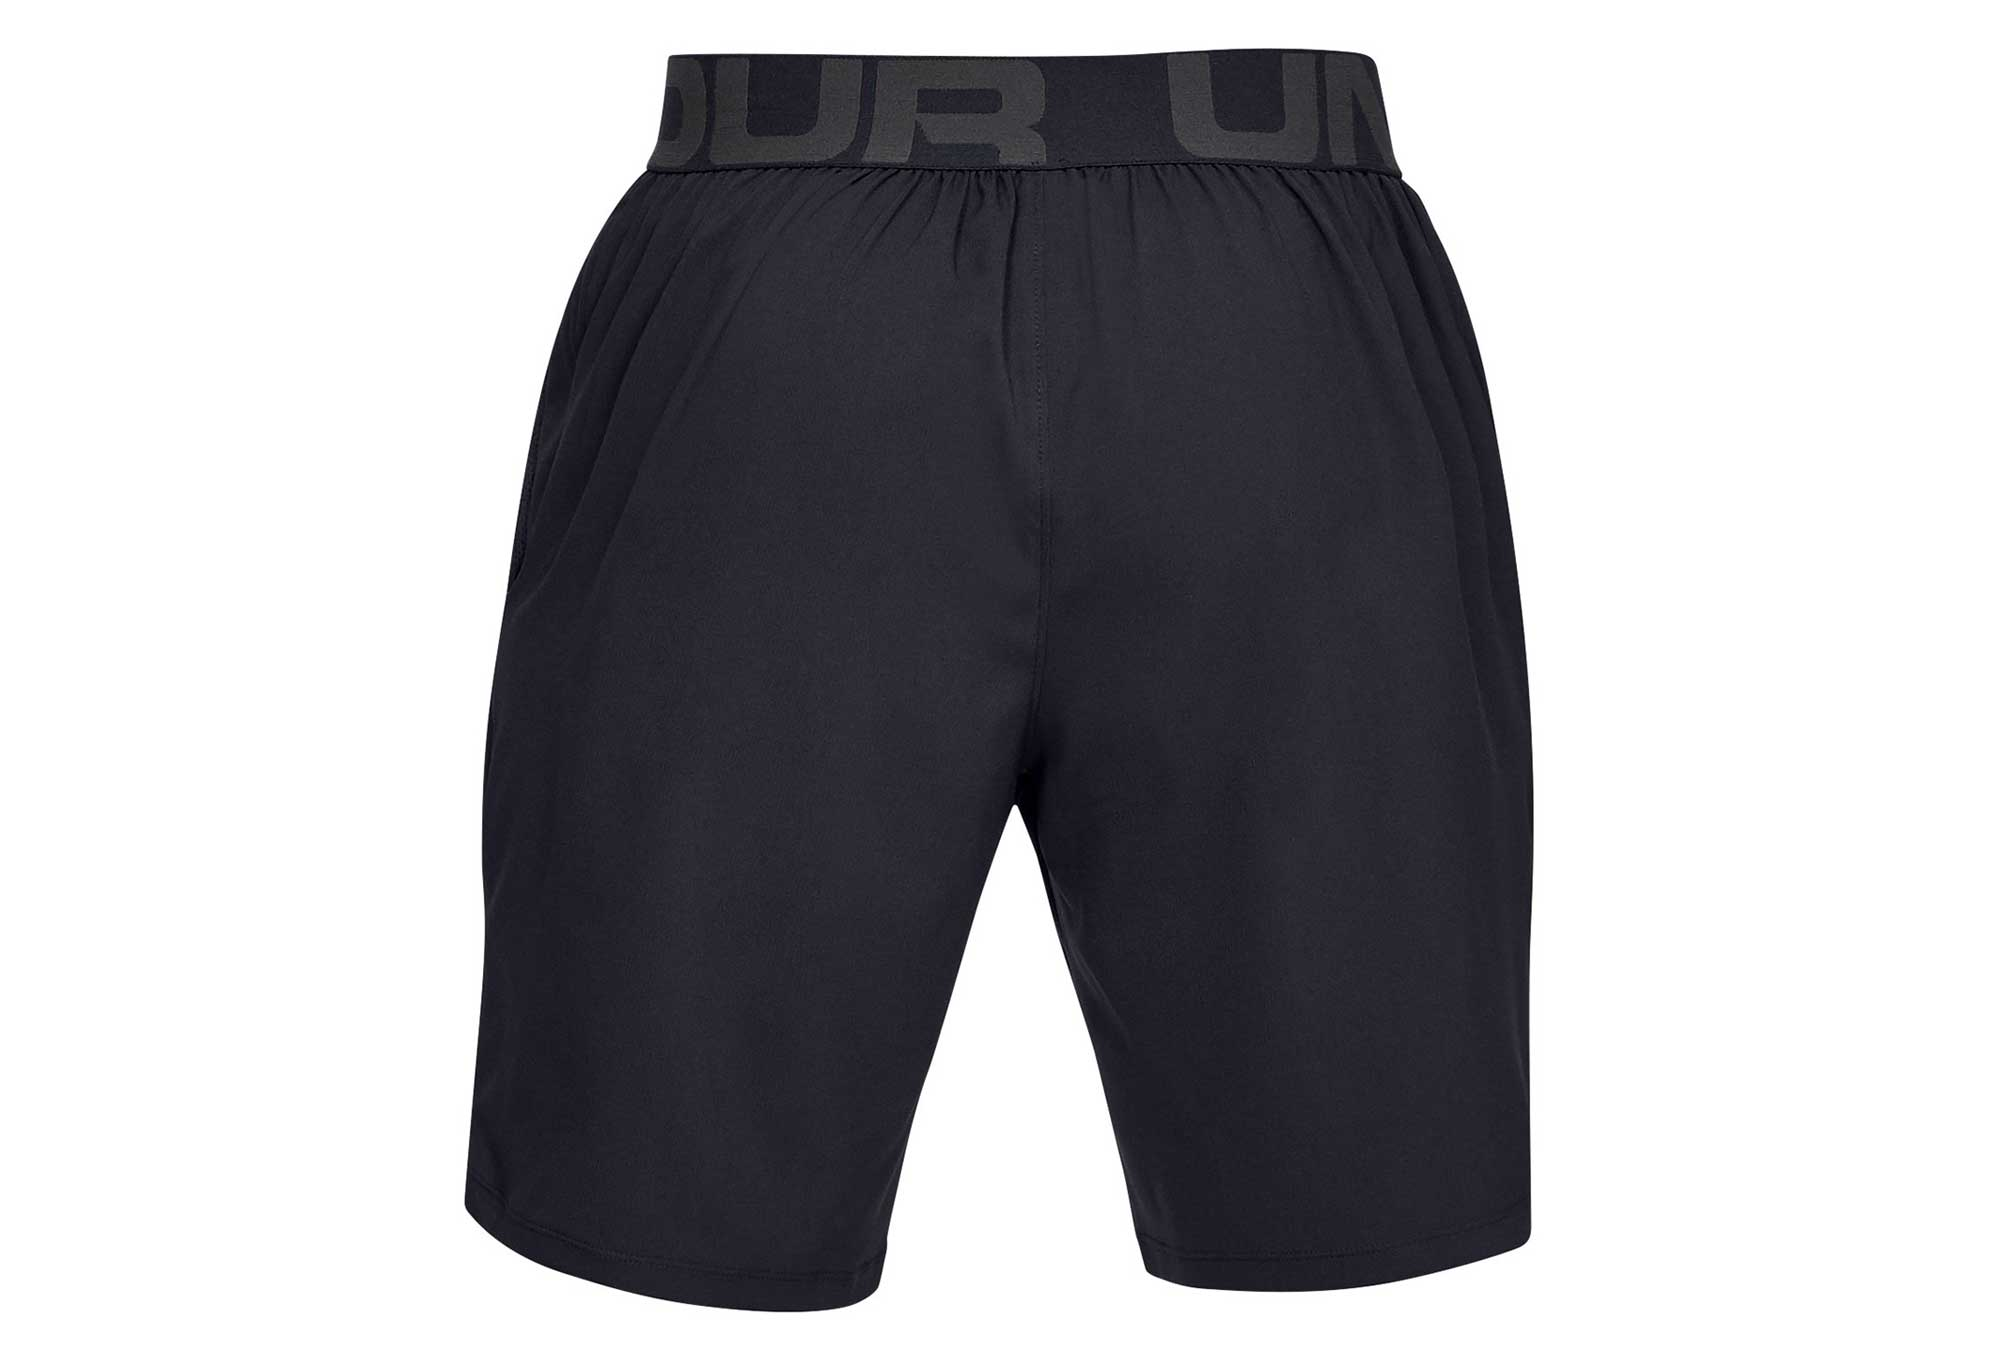 Under Armour Homme Vanish Tissé Shorts Pantalon Pantalon Bleu Marine Sports